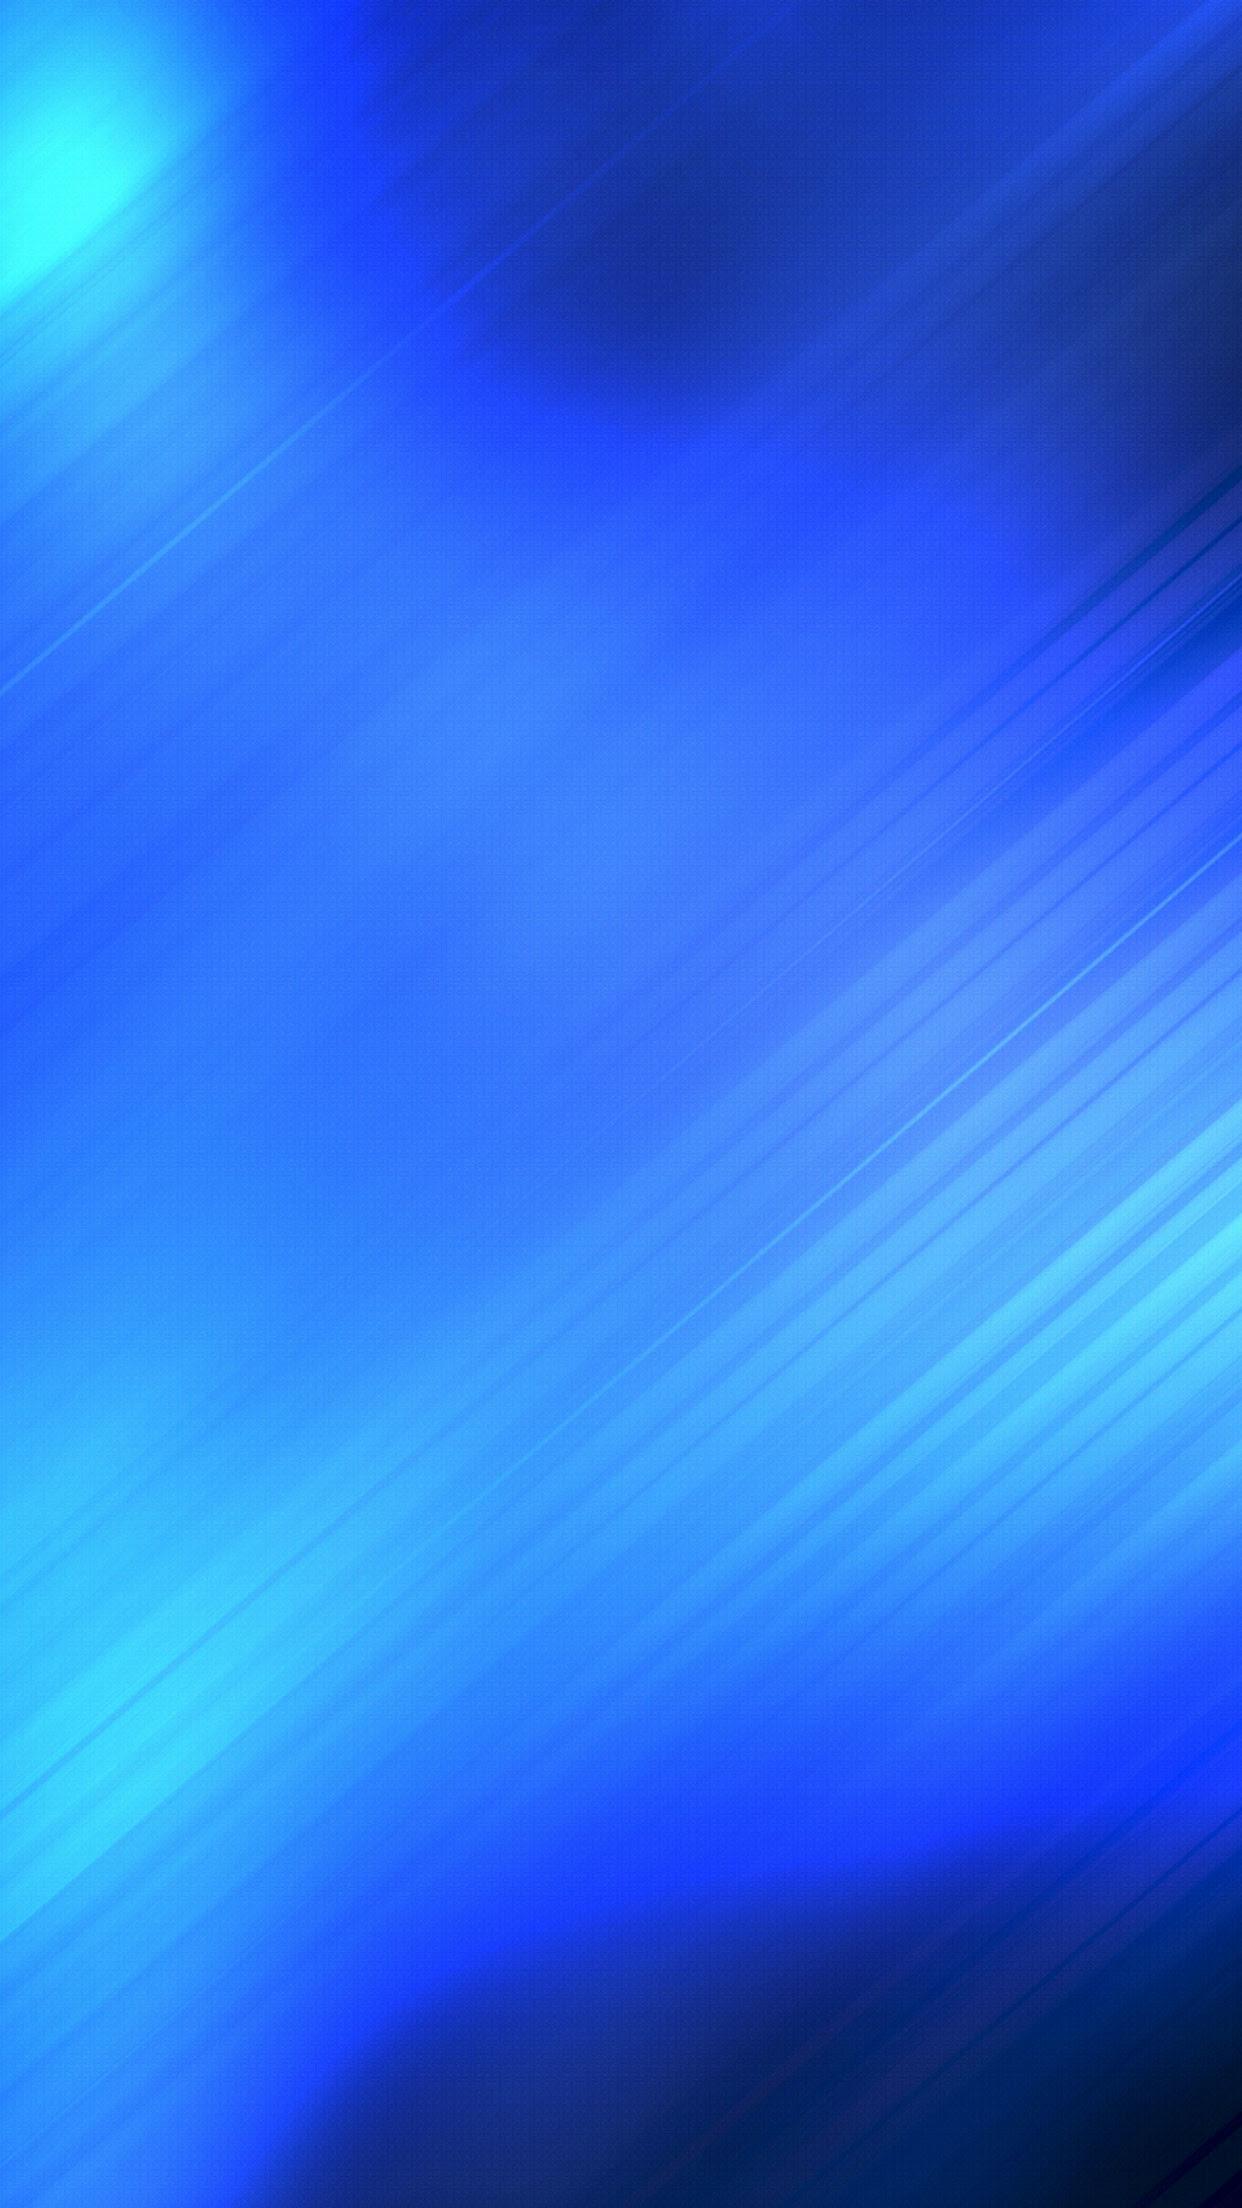 Download Kumpulan Wallpaper Abstrak Cyan HD Paling Baru